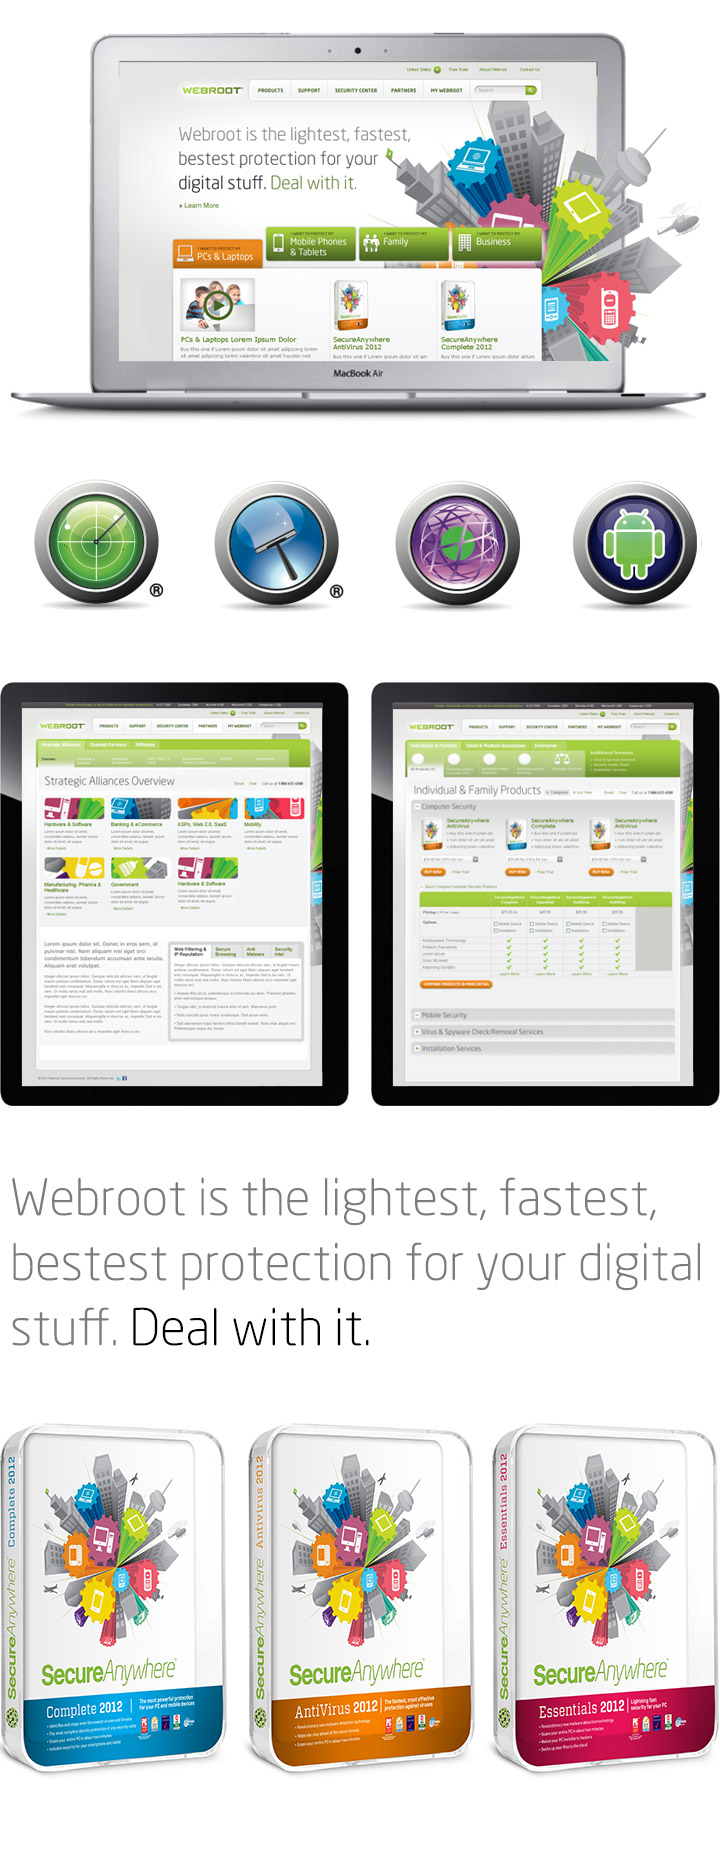 webroot design